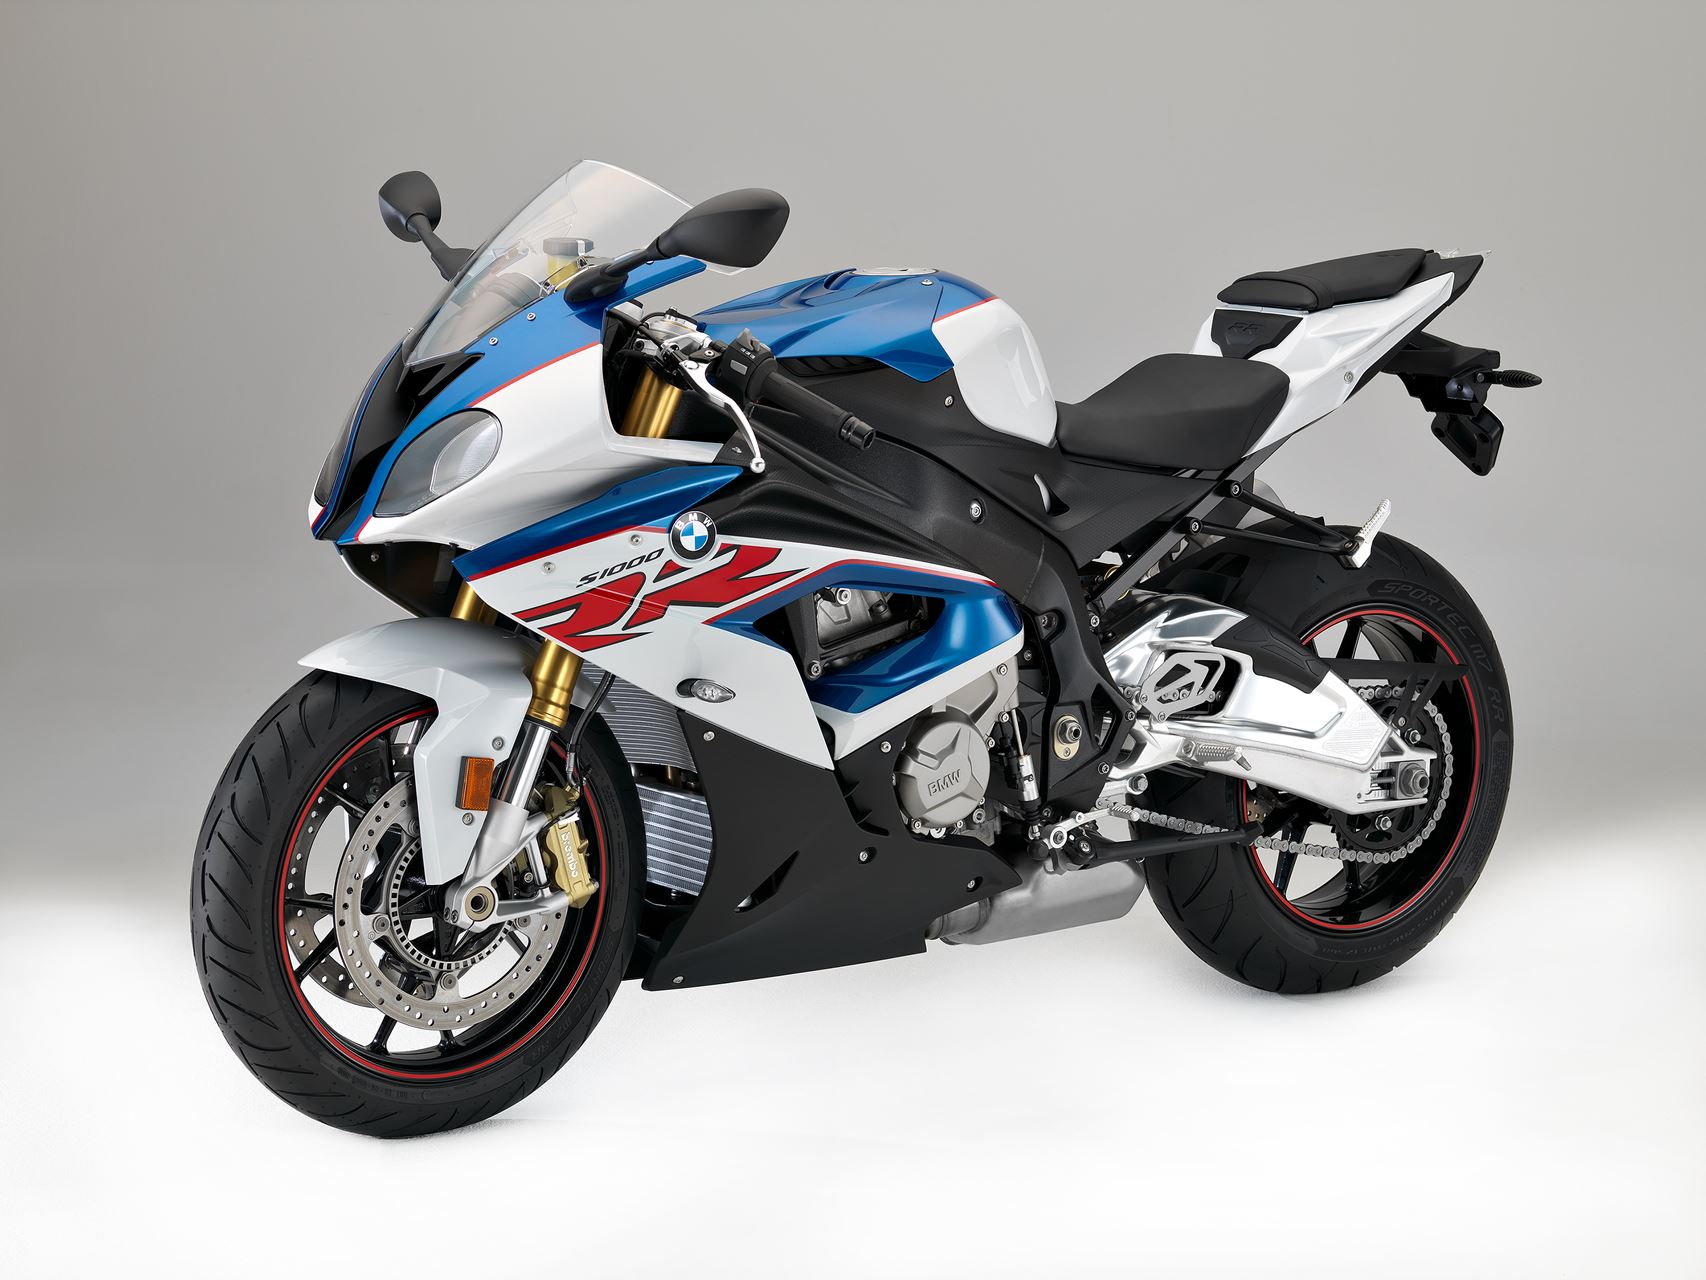 bmw s 1000 rr moto sport andar de moto. Black Bedroom Furniture Sets. Home Design Ideas